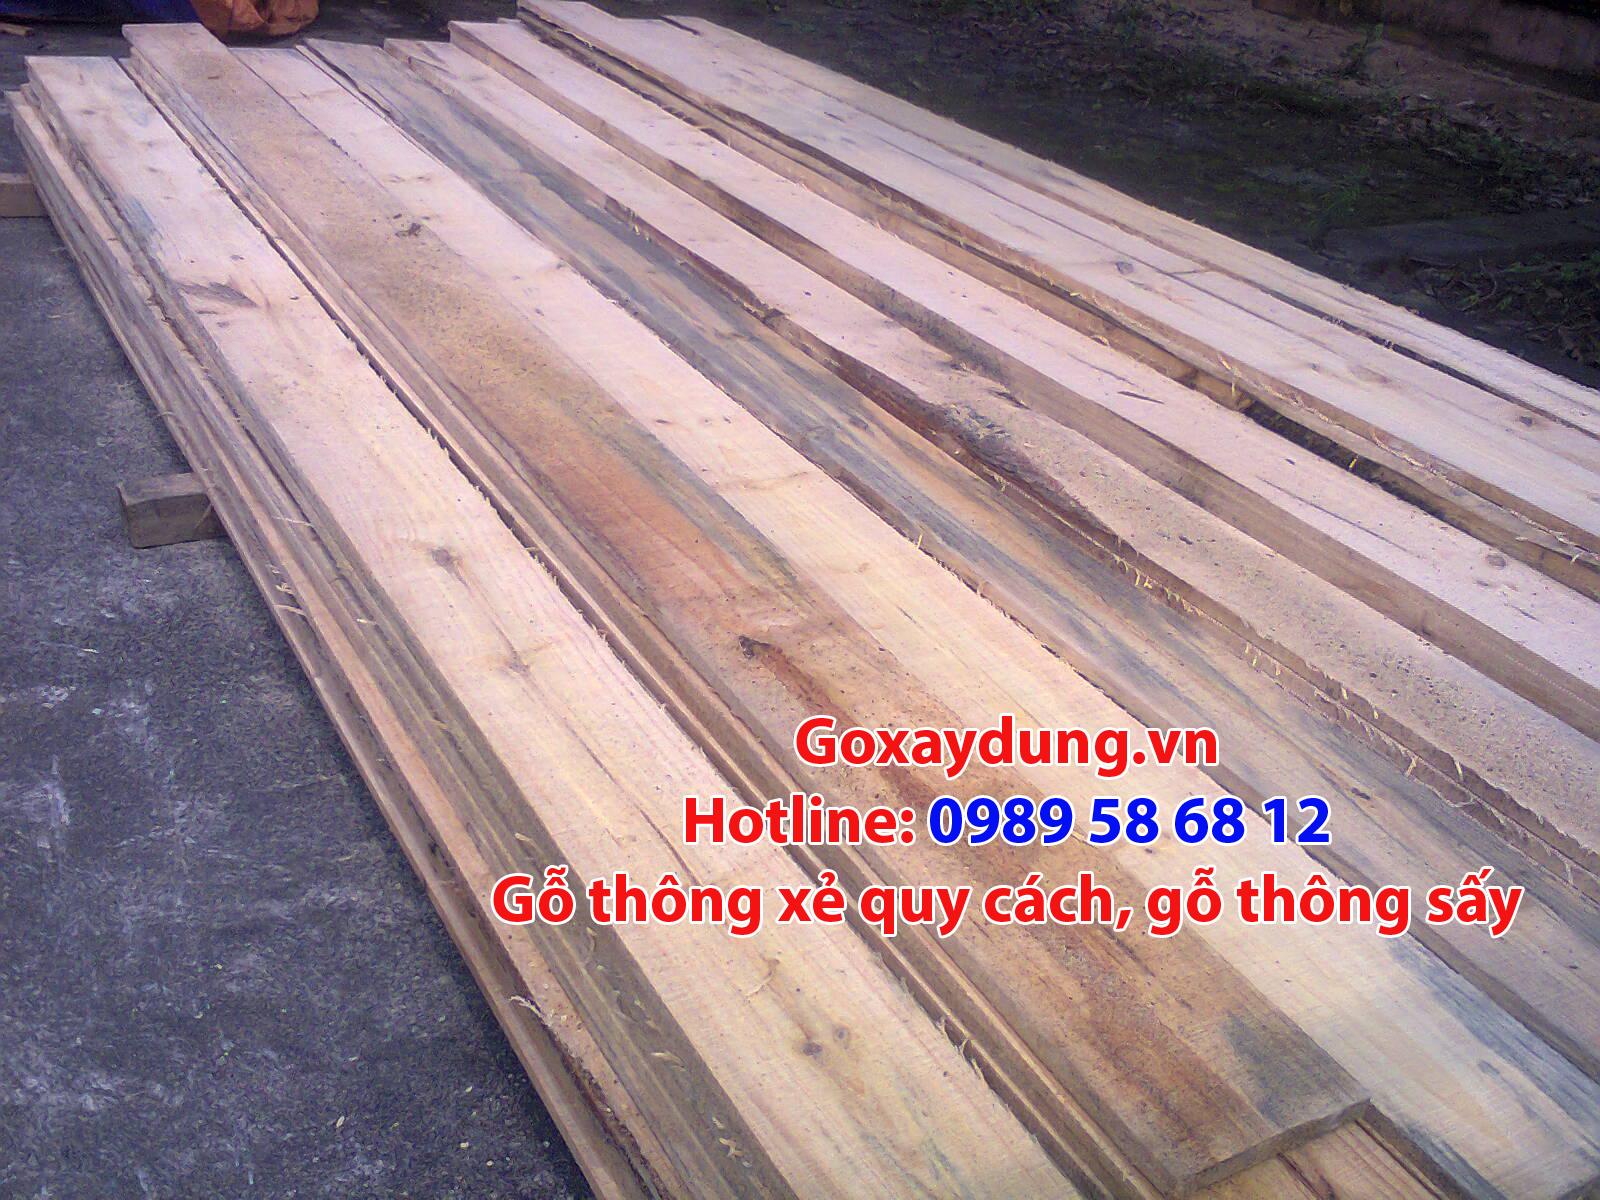 go-thong-xe-quy-cach-5-goxaydung.vn.jpg